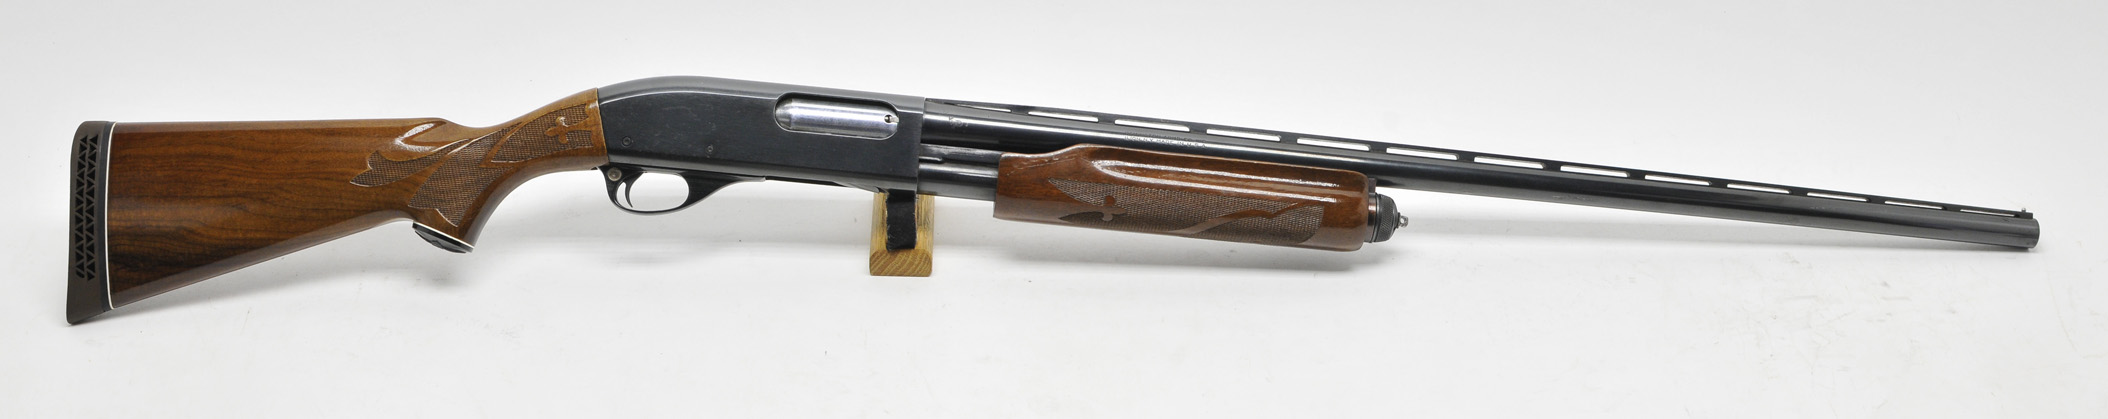 remington model 870 custom shop inc